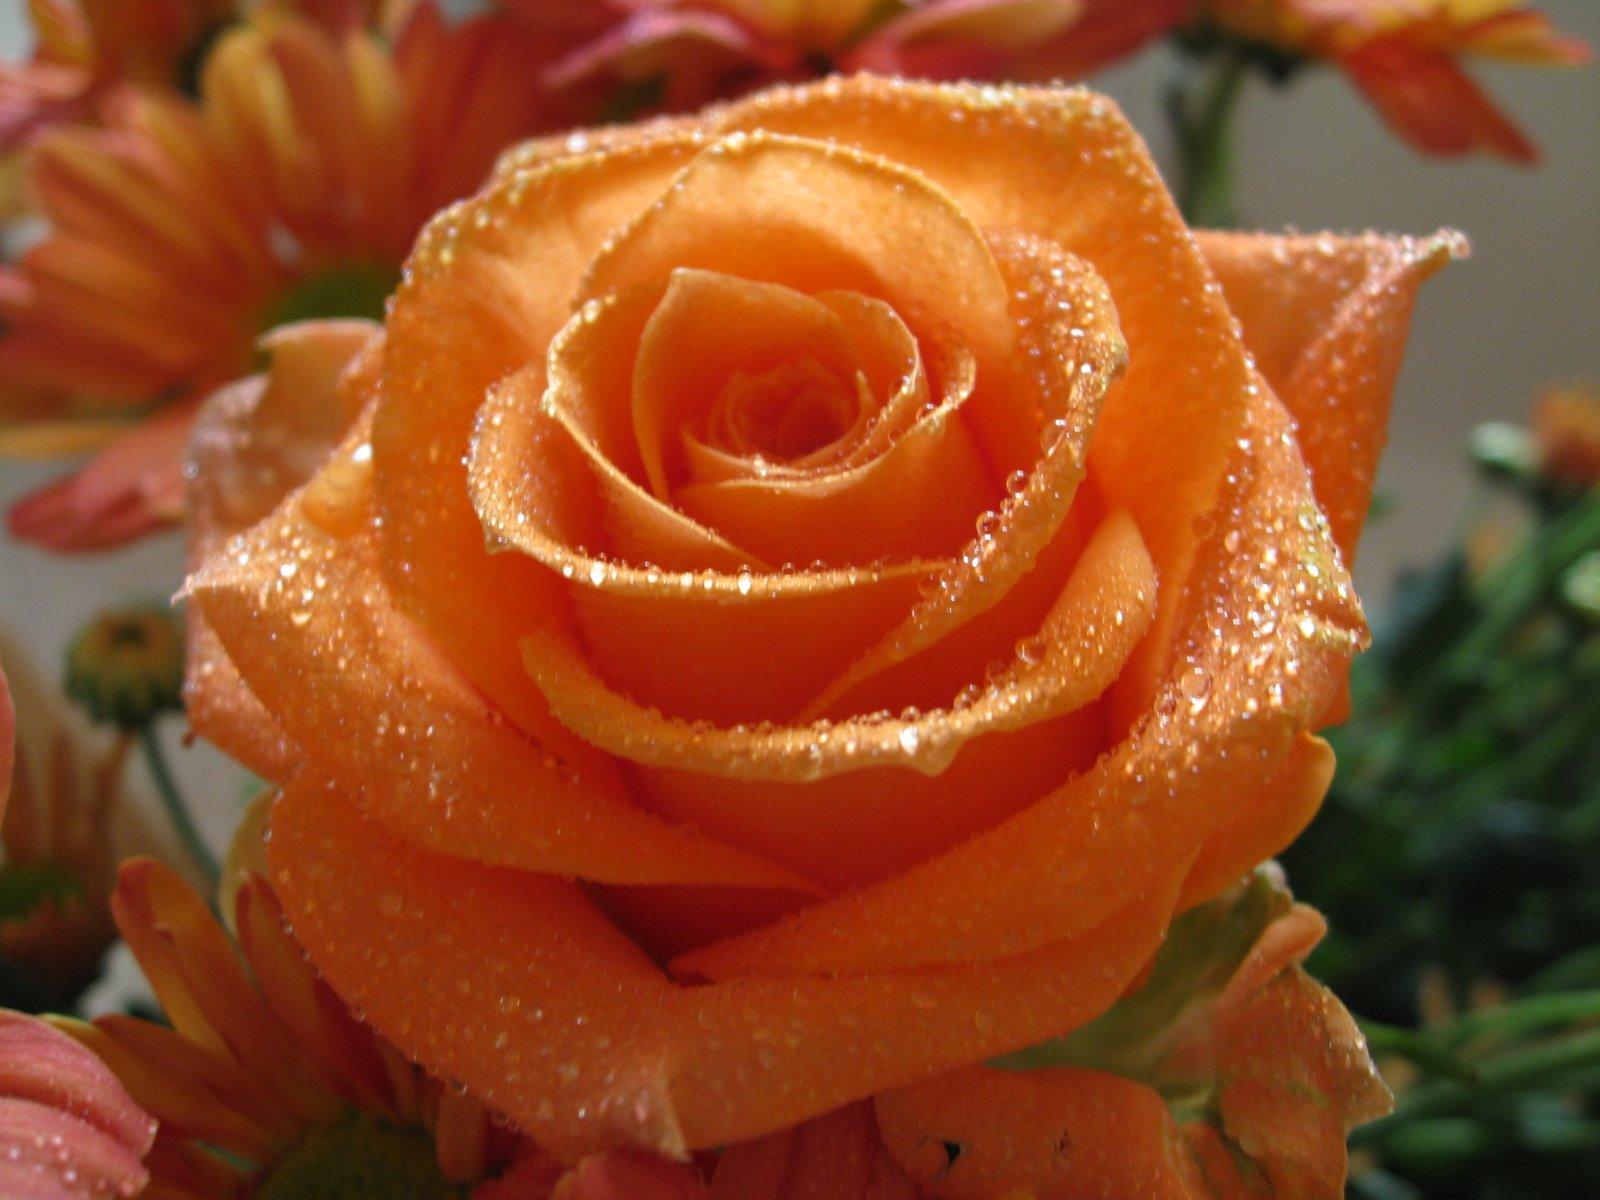 rose wallpaper hdtv 1920x1080 Orange Rose 02 ...